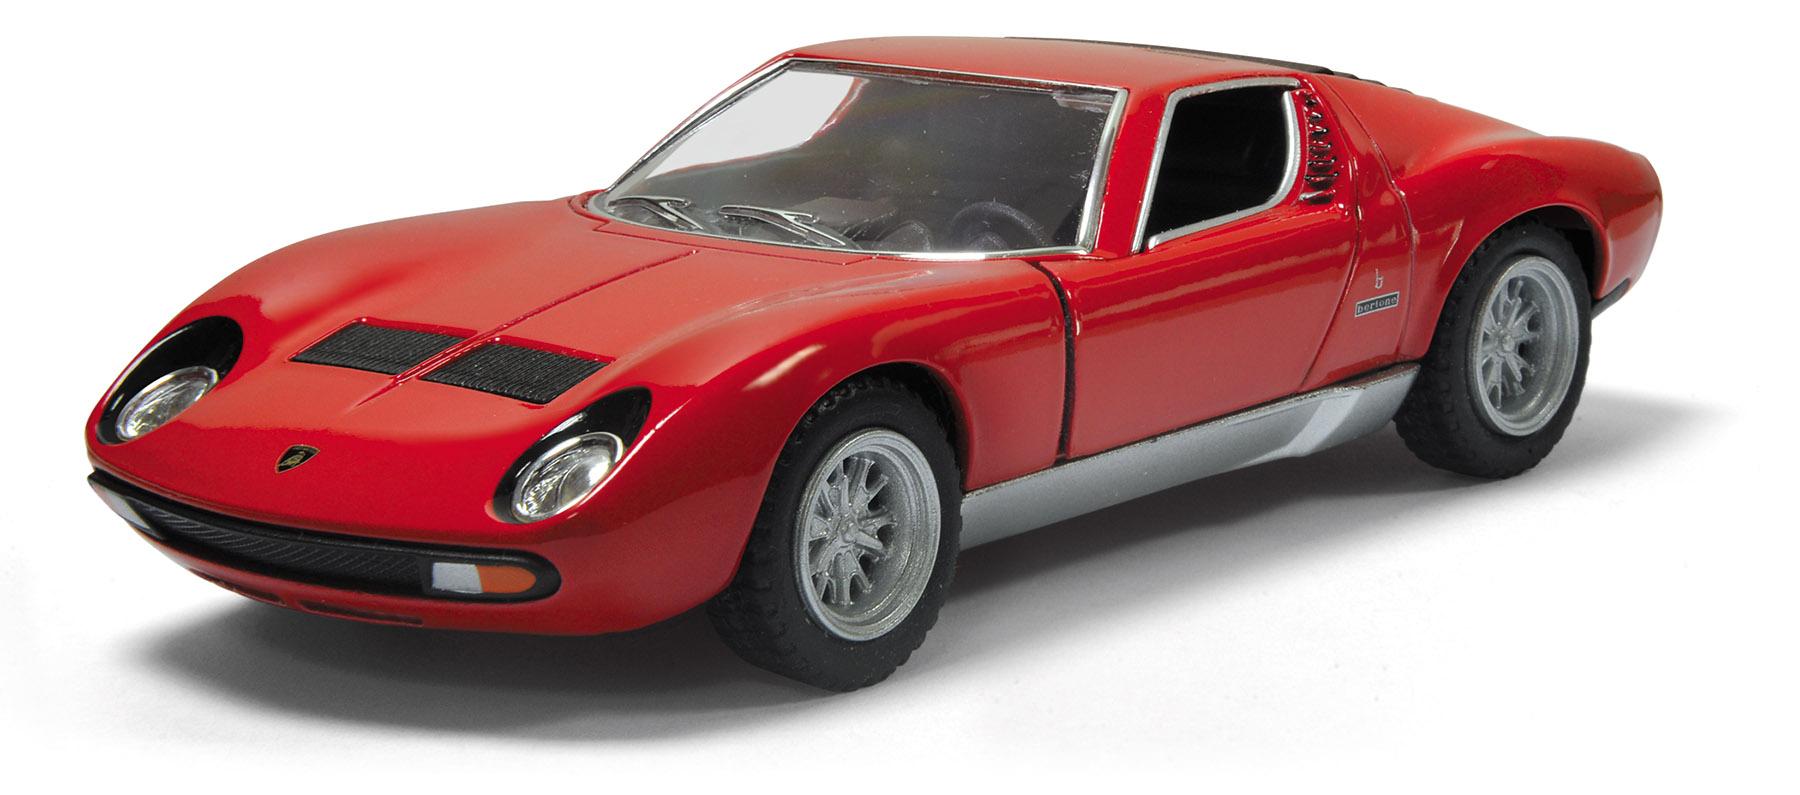 1971 Lamborghini Miura P400 SV 5390D